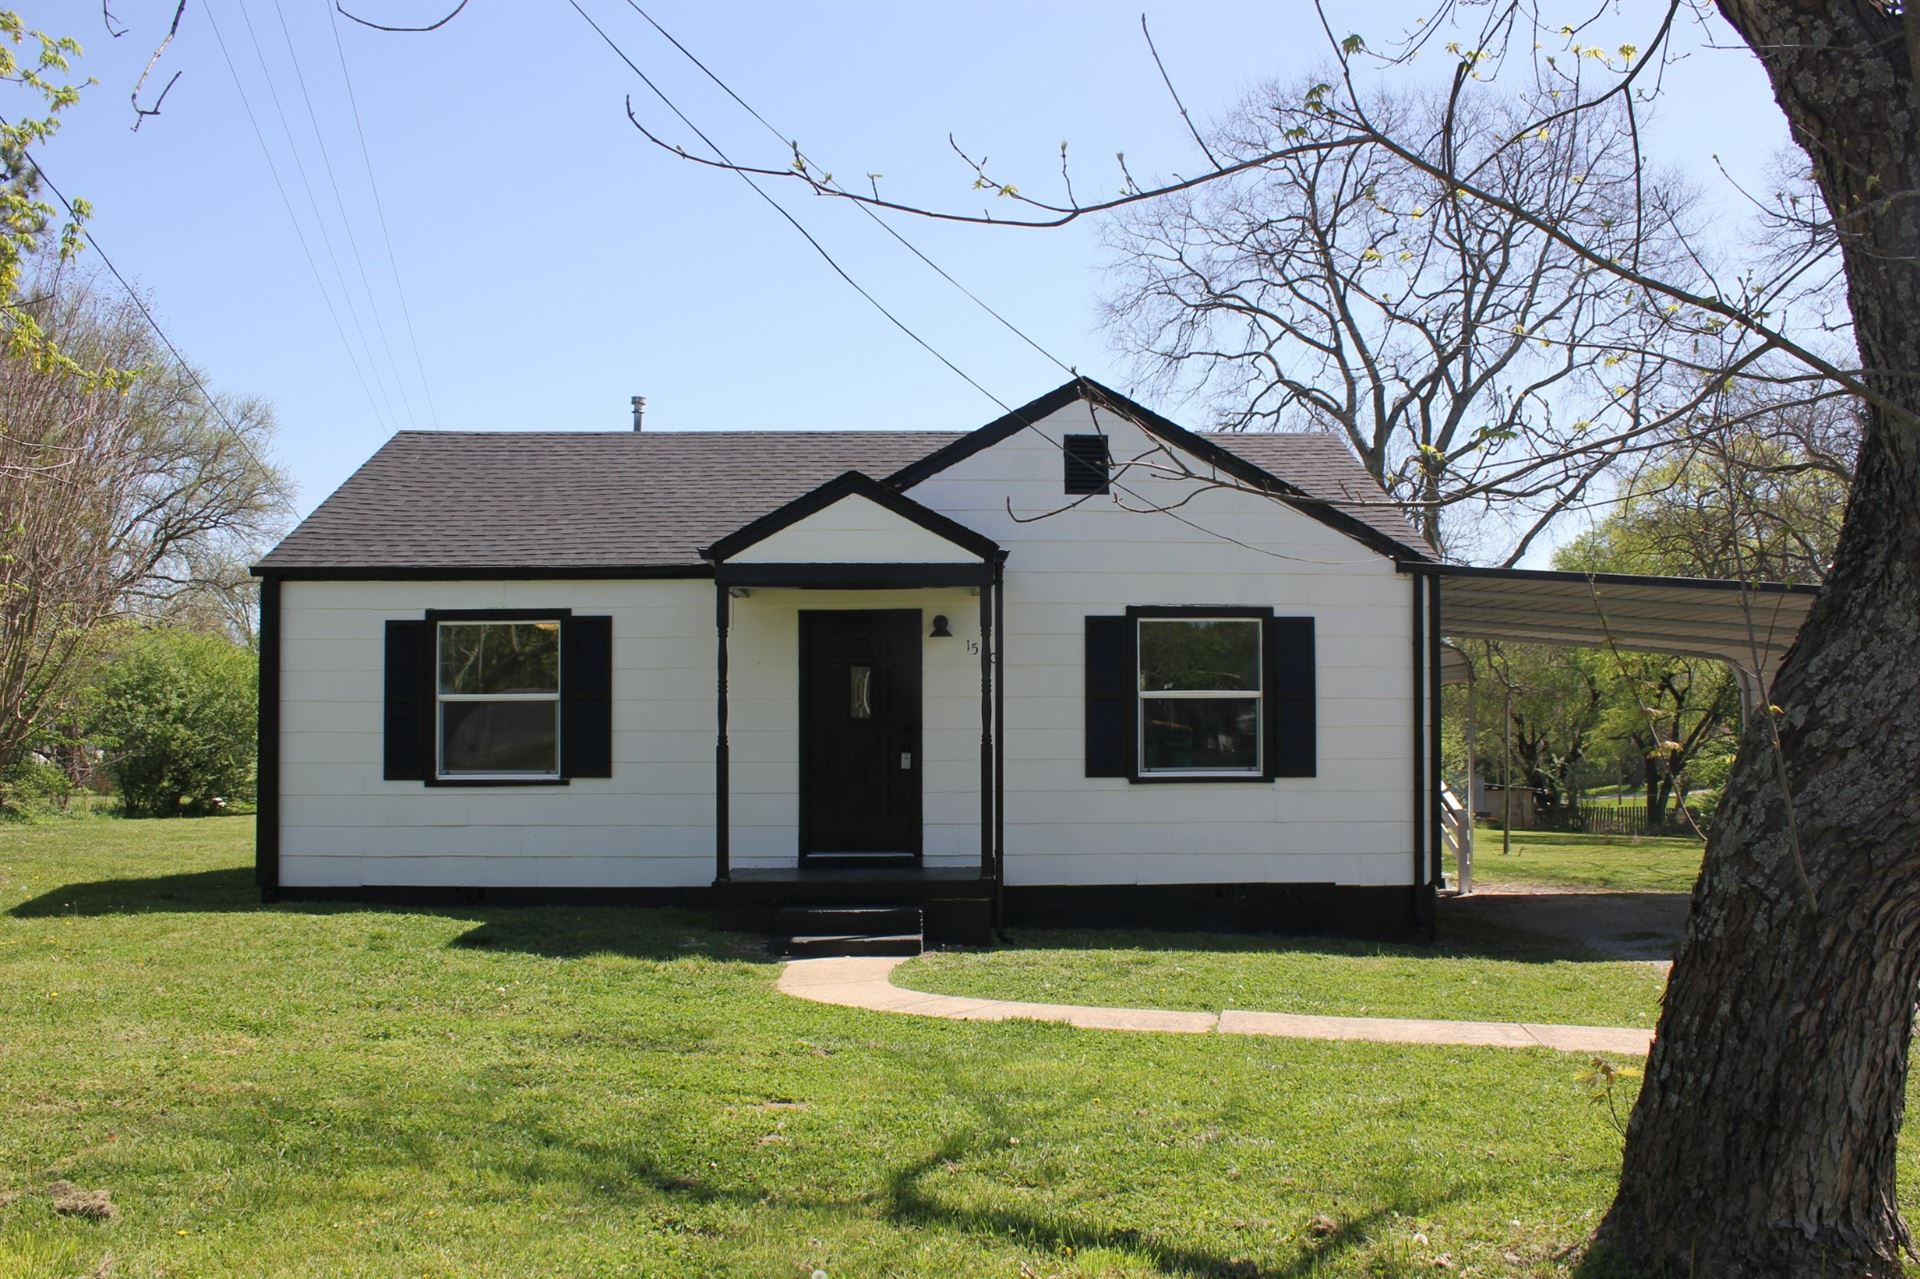 1520 Old Columbia Rd, Lewisburg, TN 37091 - MLS#: 2243705